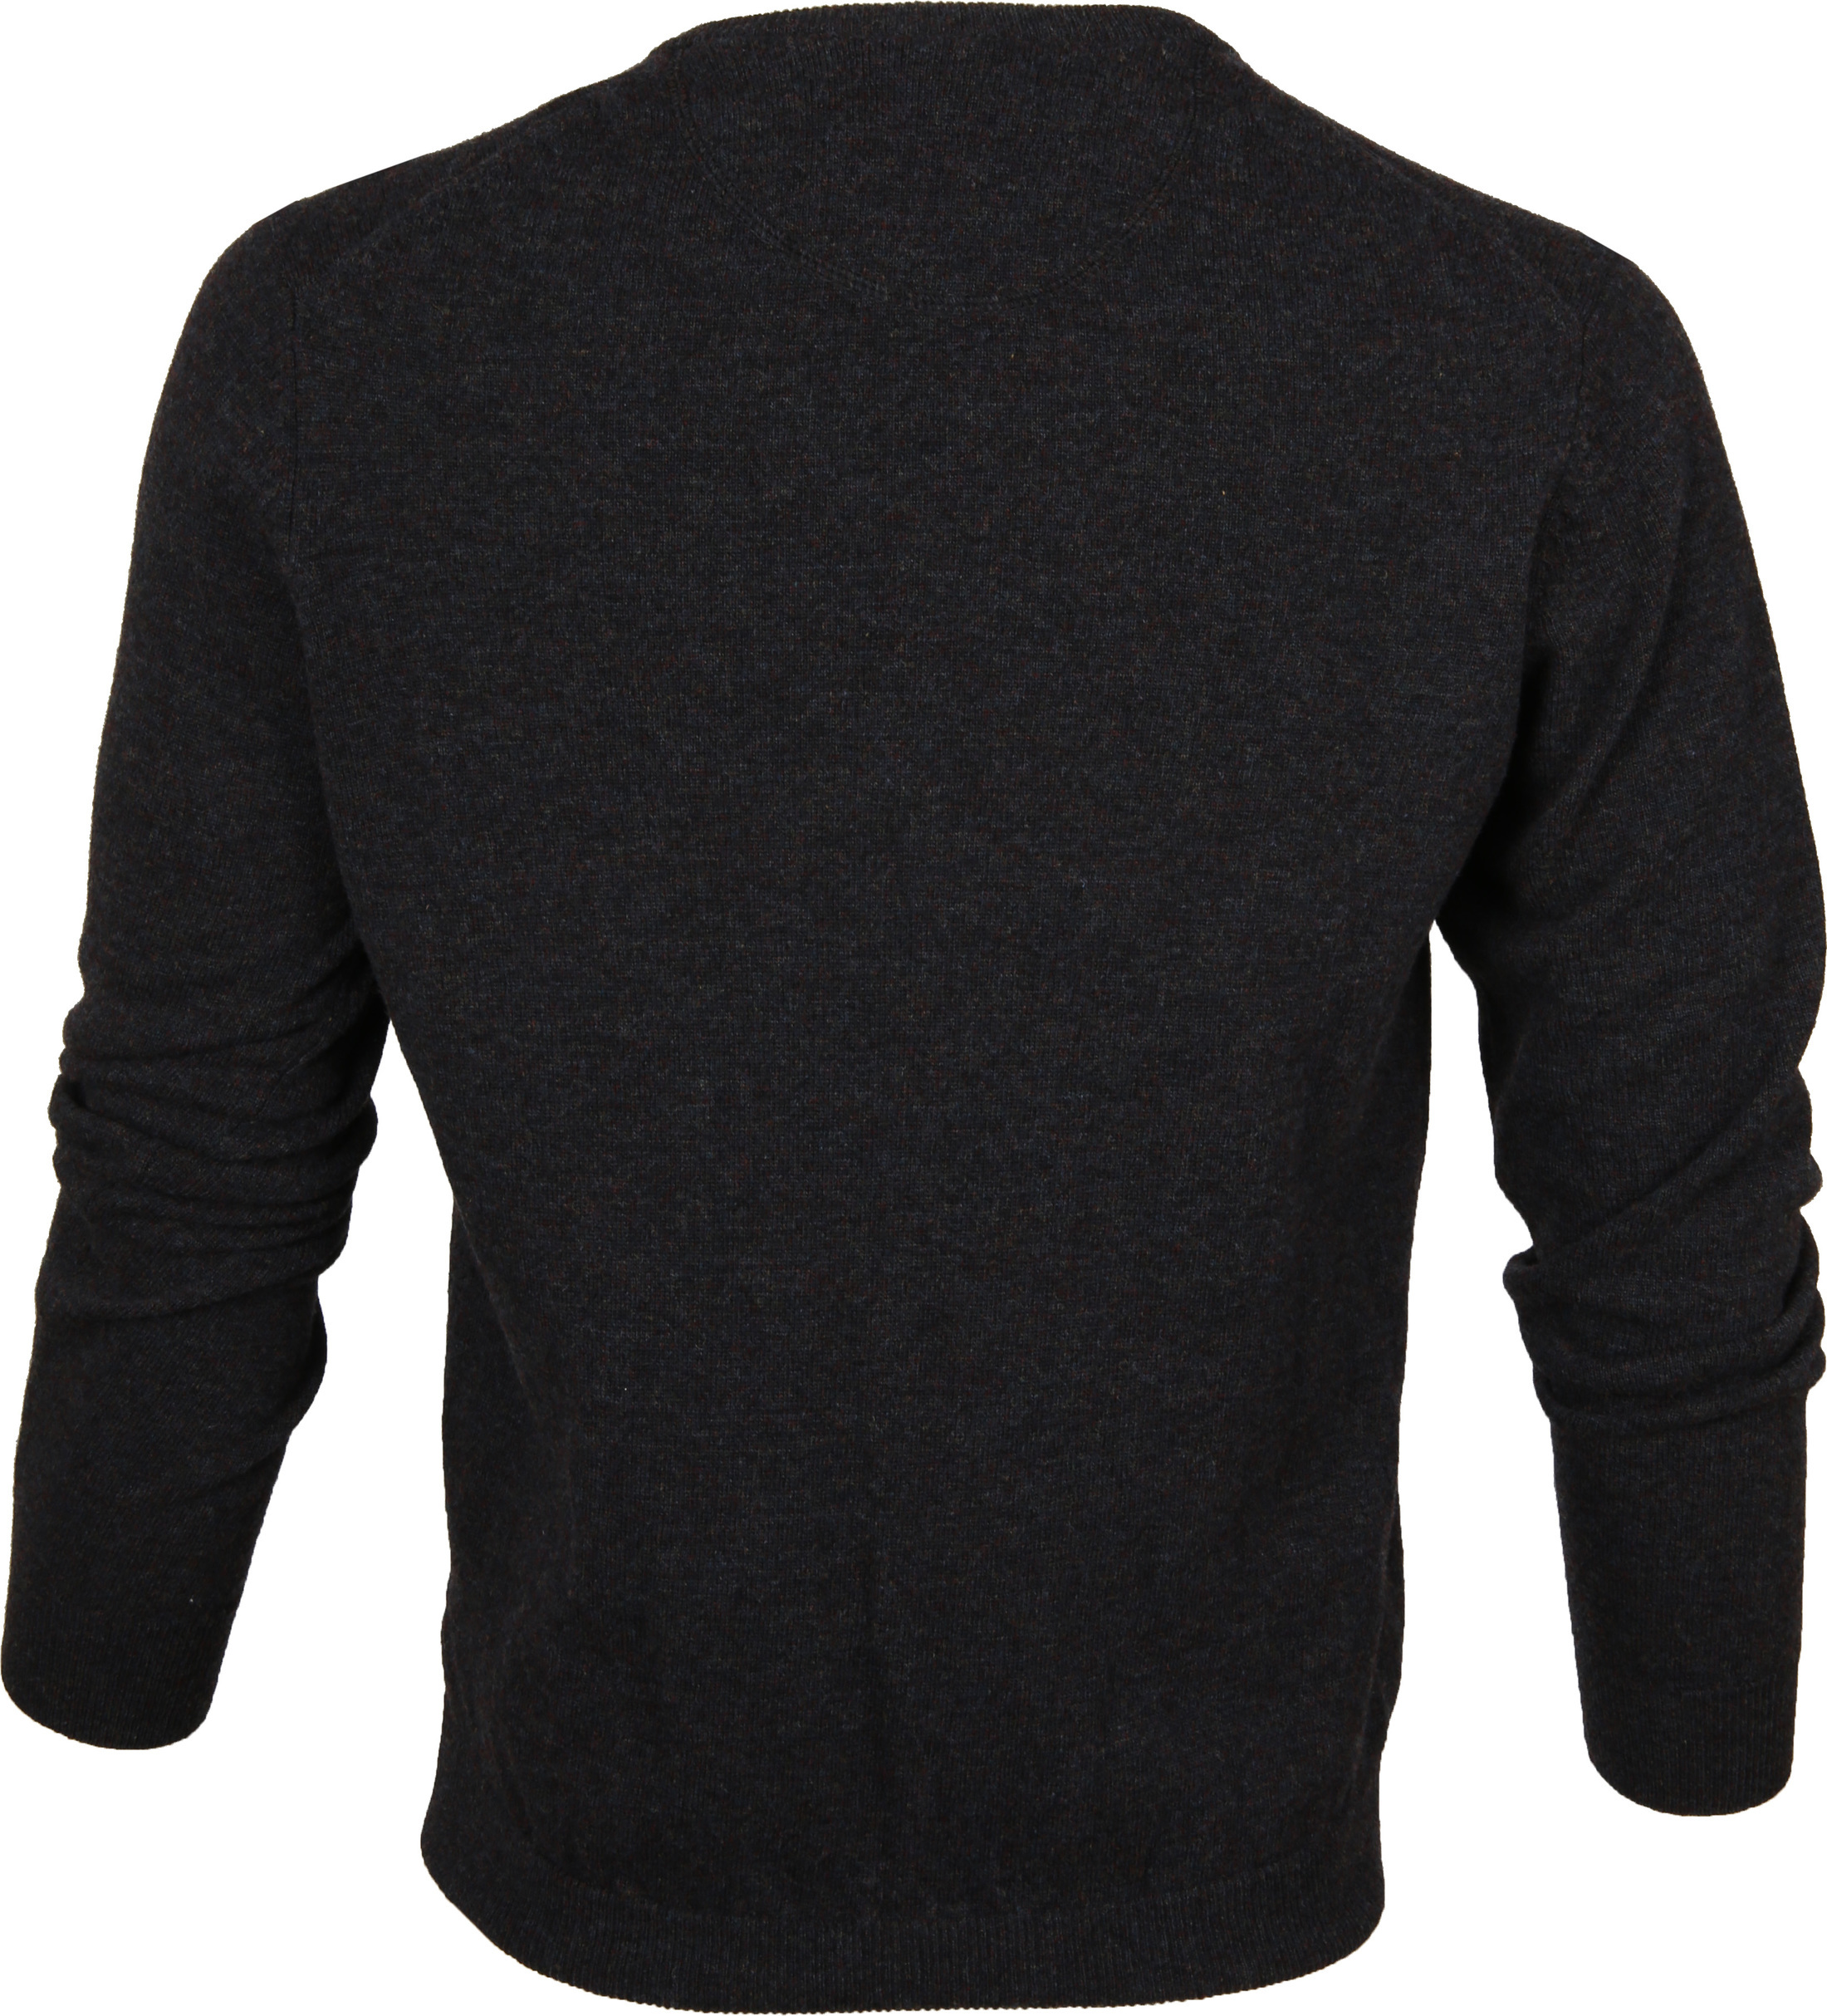 Suitable Pullover Lammwolle V-Ausschnitt Anthrazit foto 2